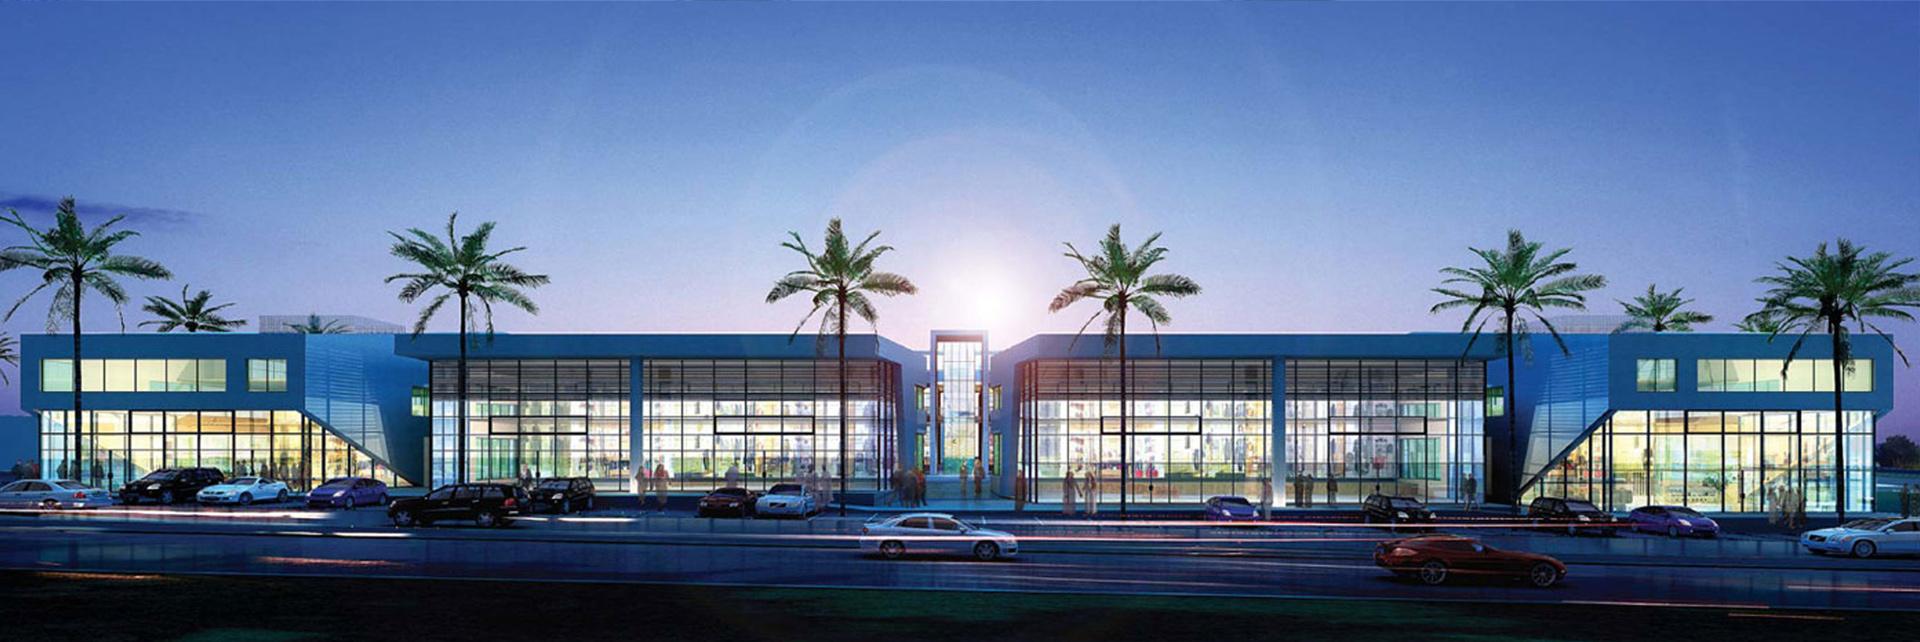 Taawon Mall